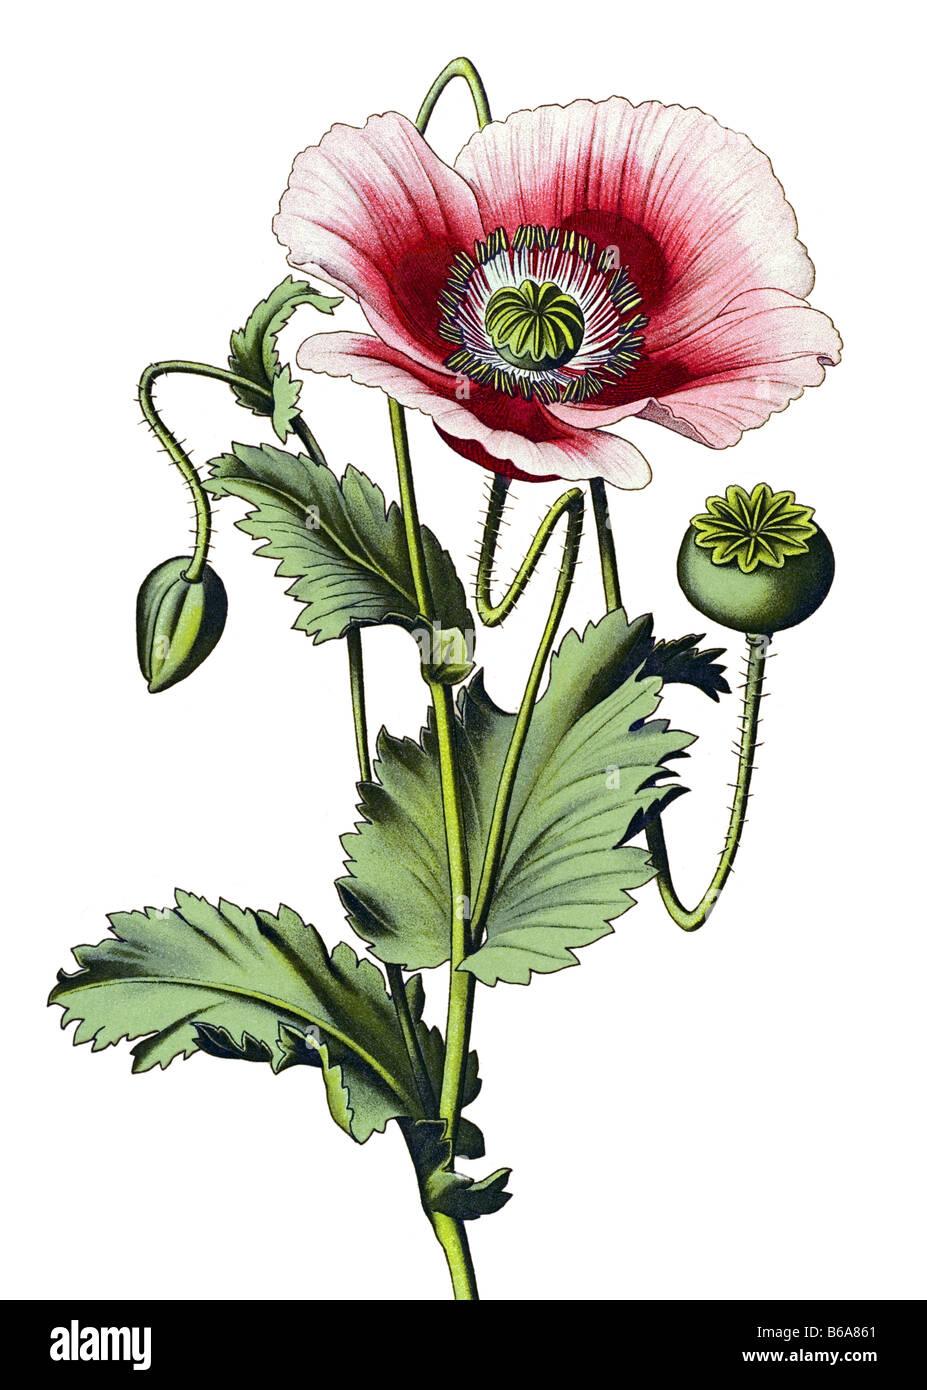 Botanical Illustration of the Papaver Bracteatum Persian Poppy